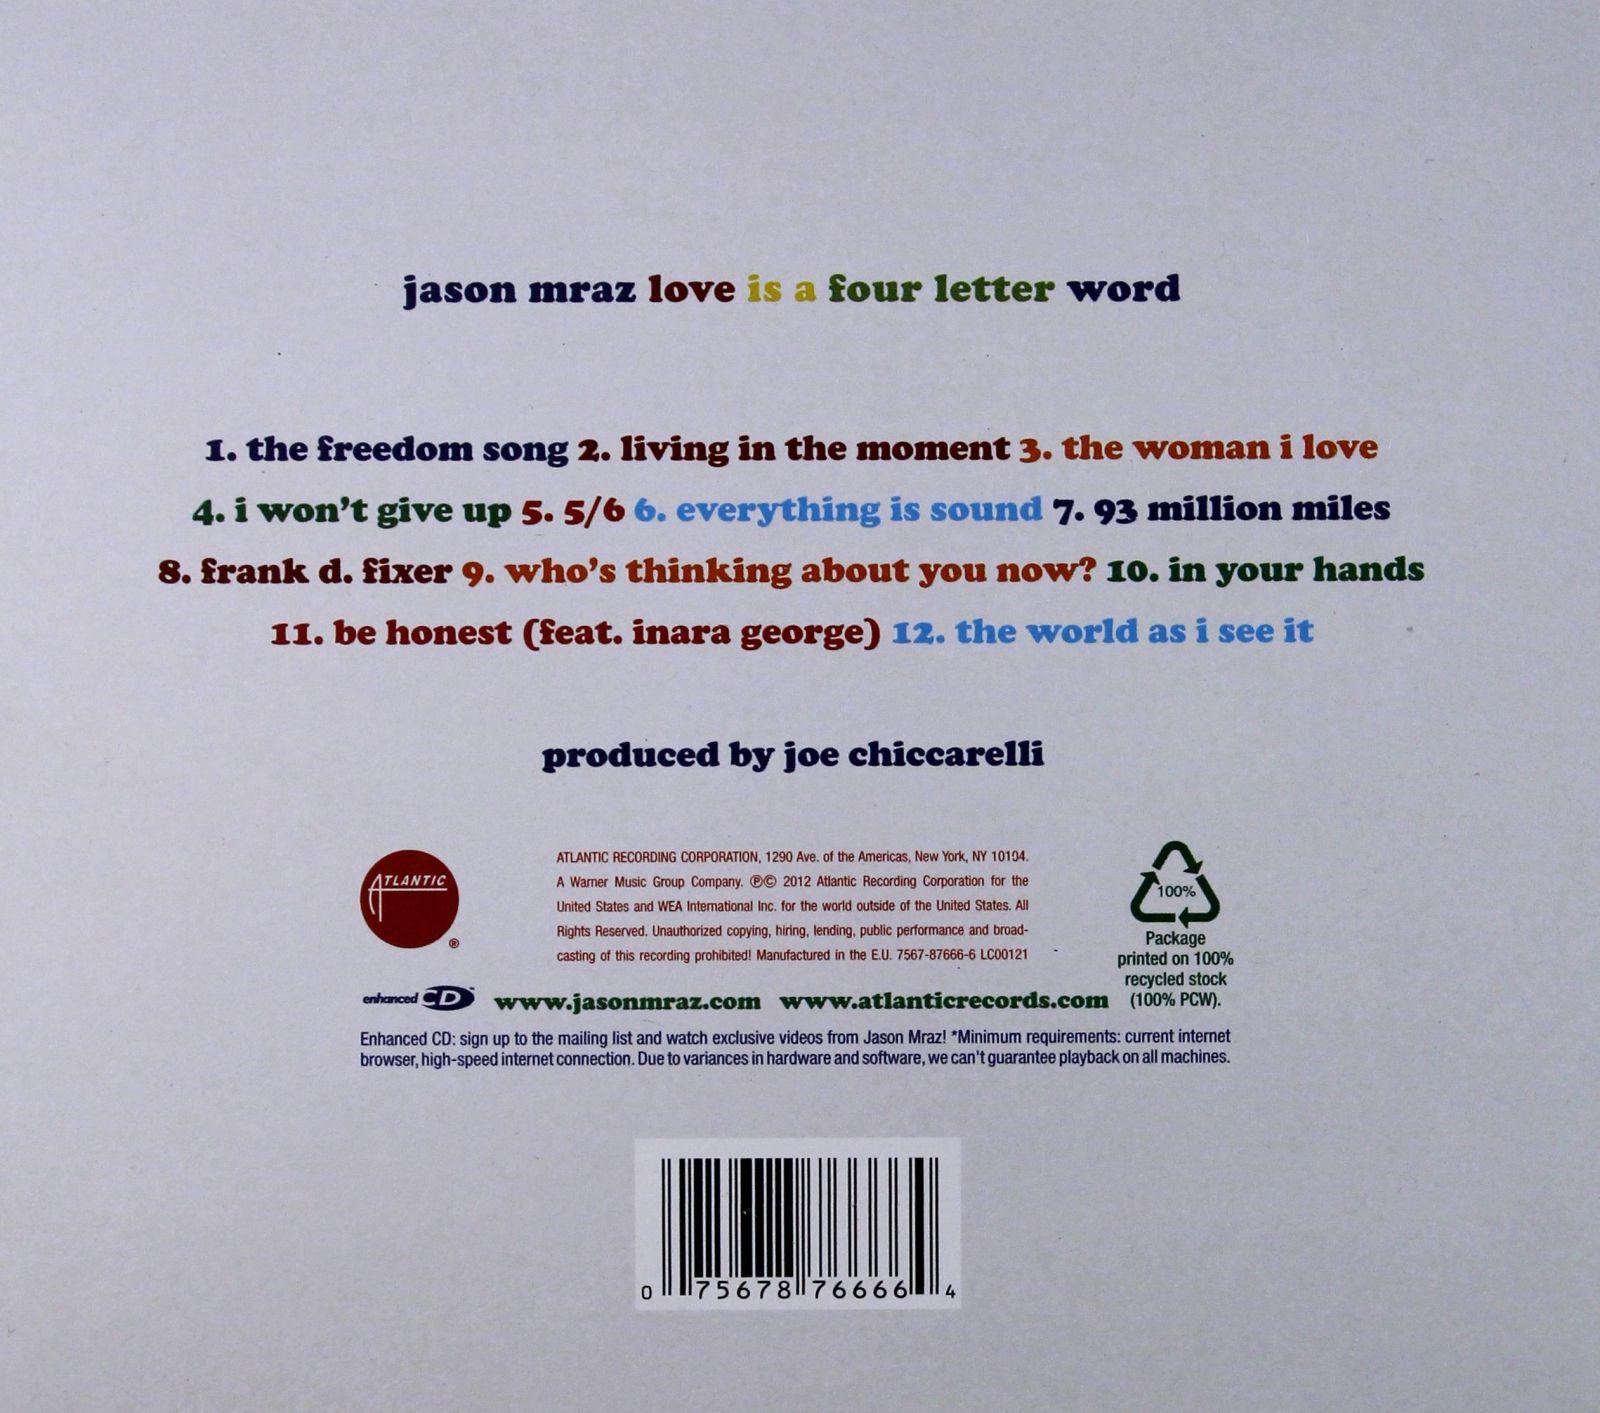 JASON MRAZ LOVE IS A FOUR LETTER WORD ECOPACK C